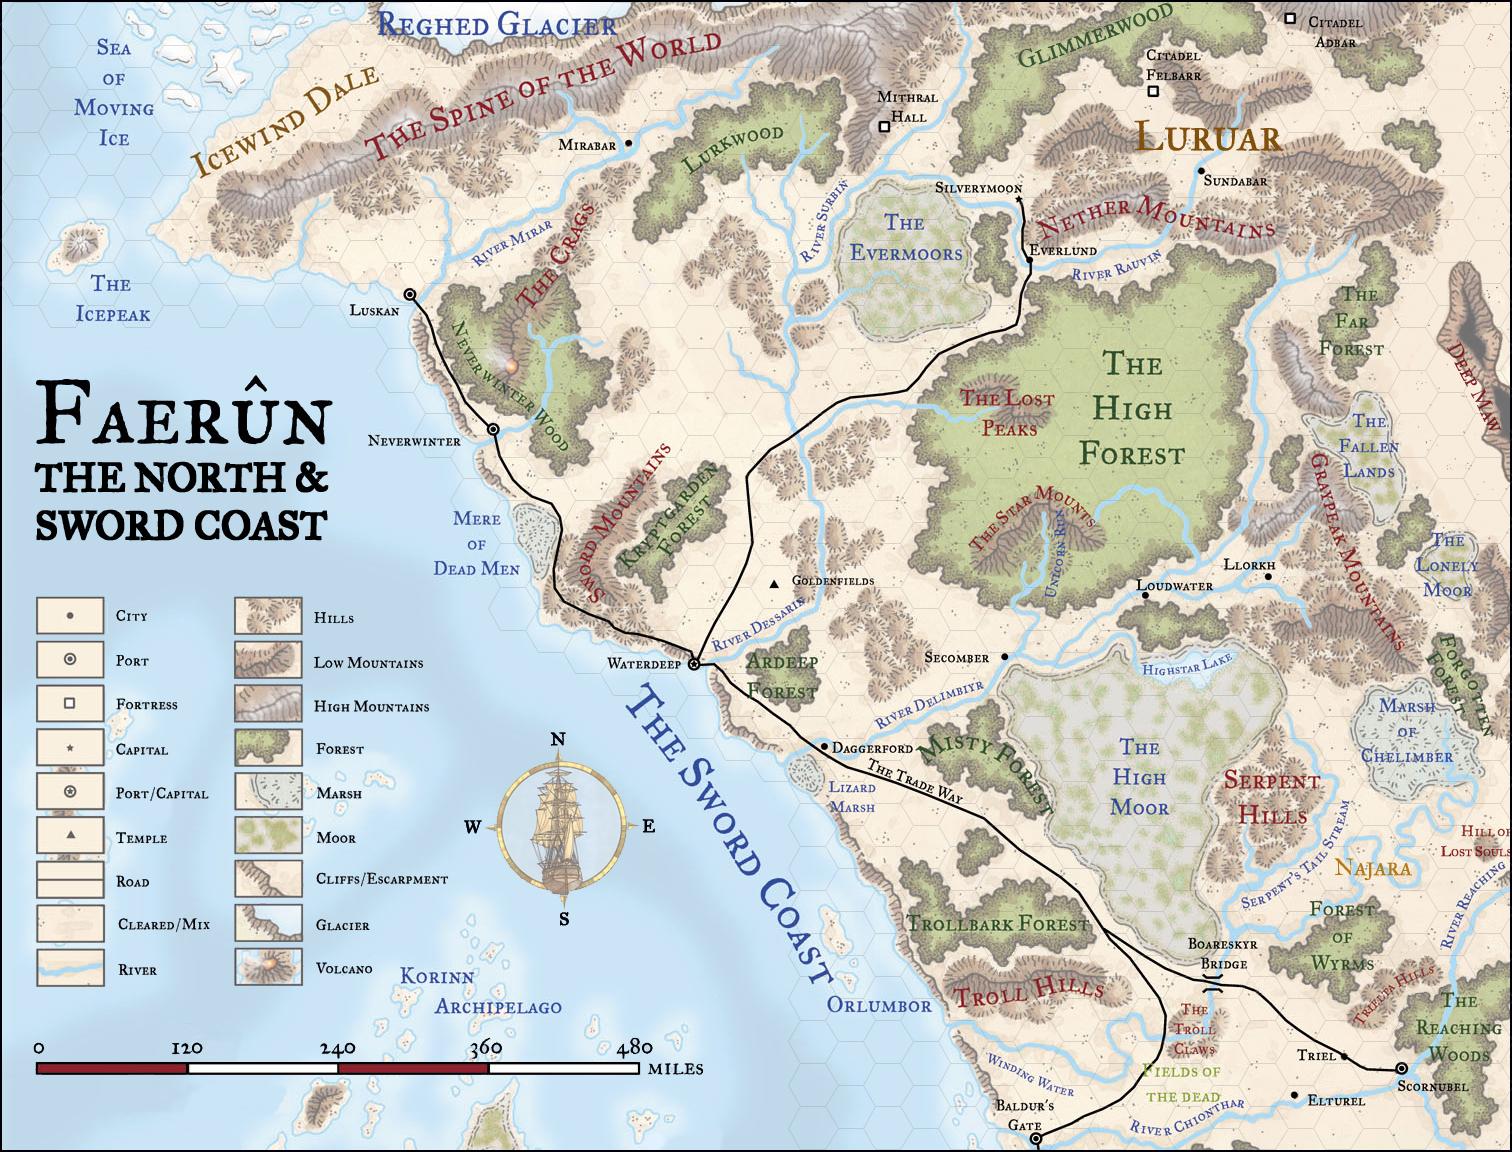 Faerun_North___Sword_Coast.jpg